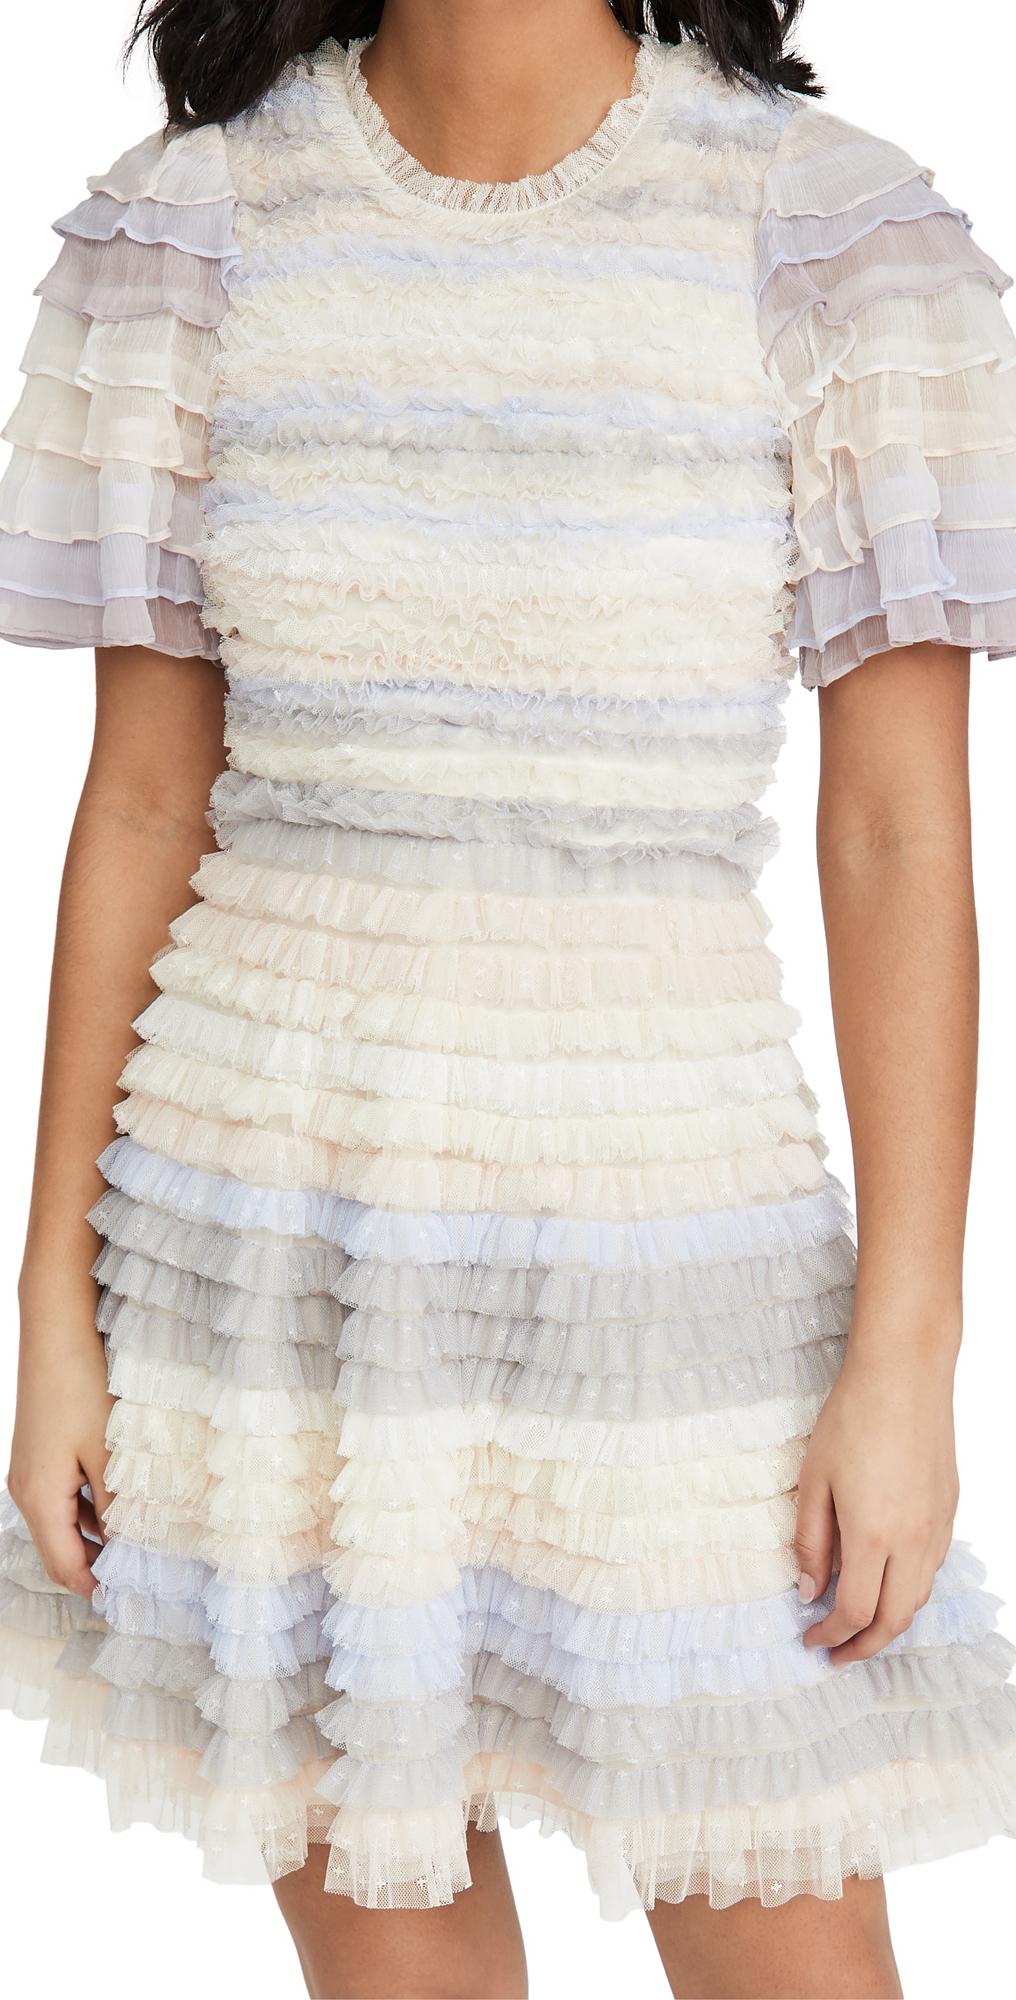 Needle & Thread Luella Ruffle Mini Dress